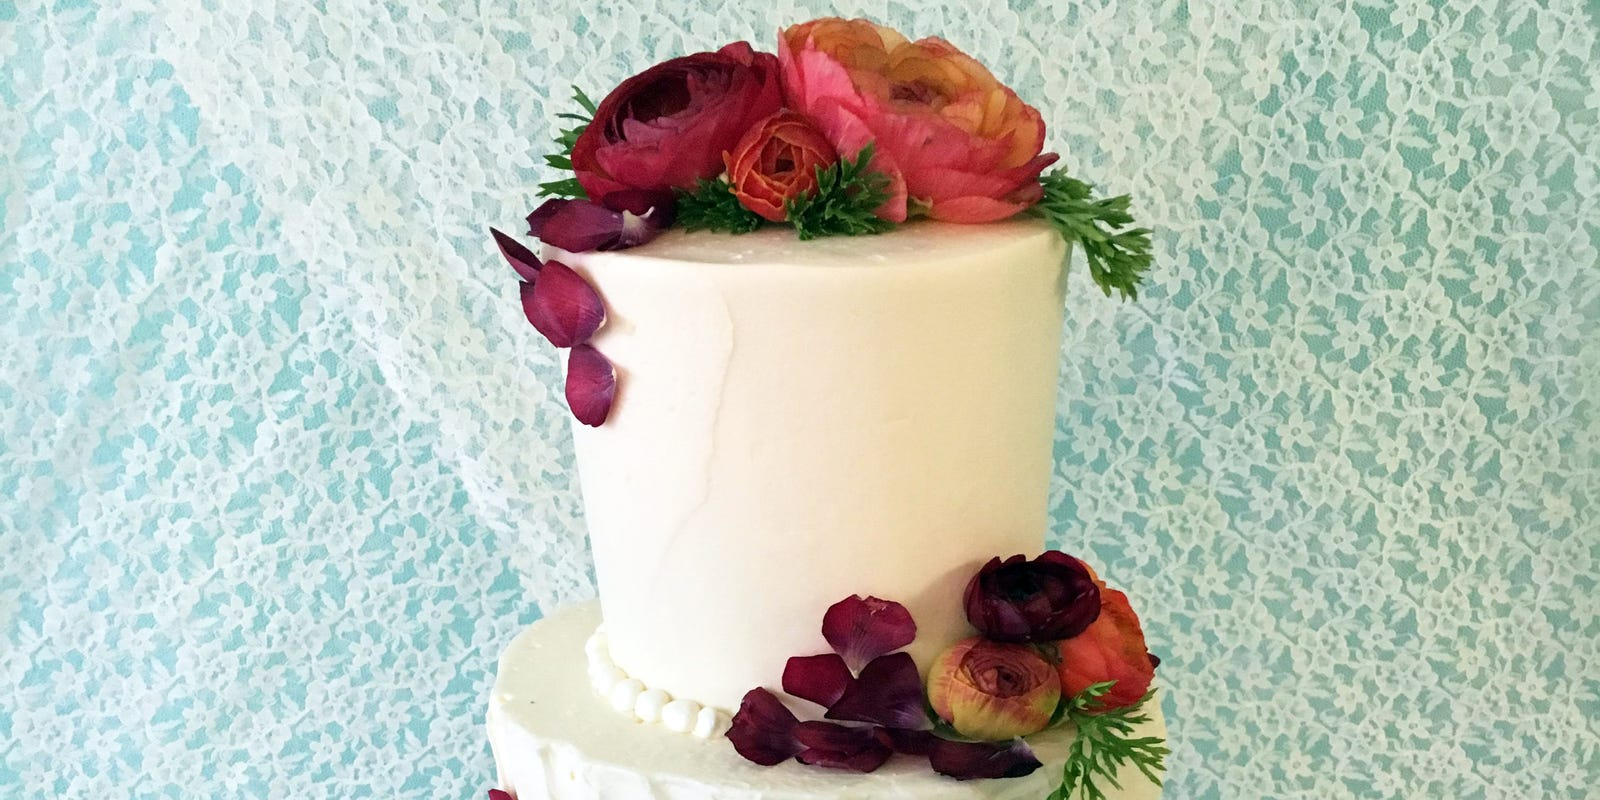 cedarburg baker creates a royal wedding cake for milwaukee viewers royal wedding cake for milwaukee viewers